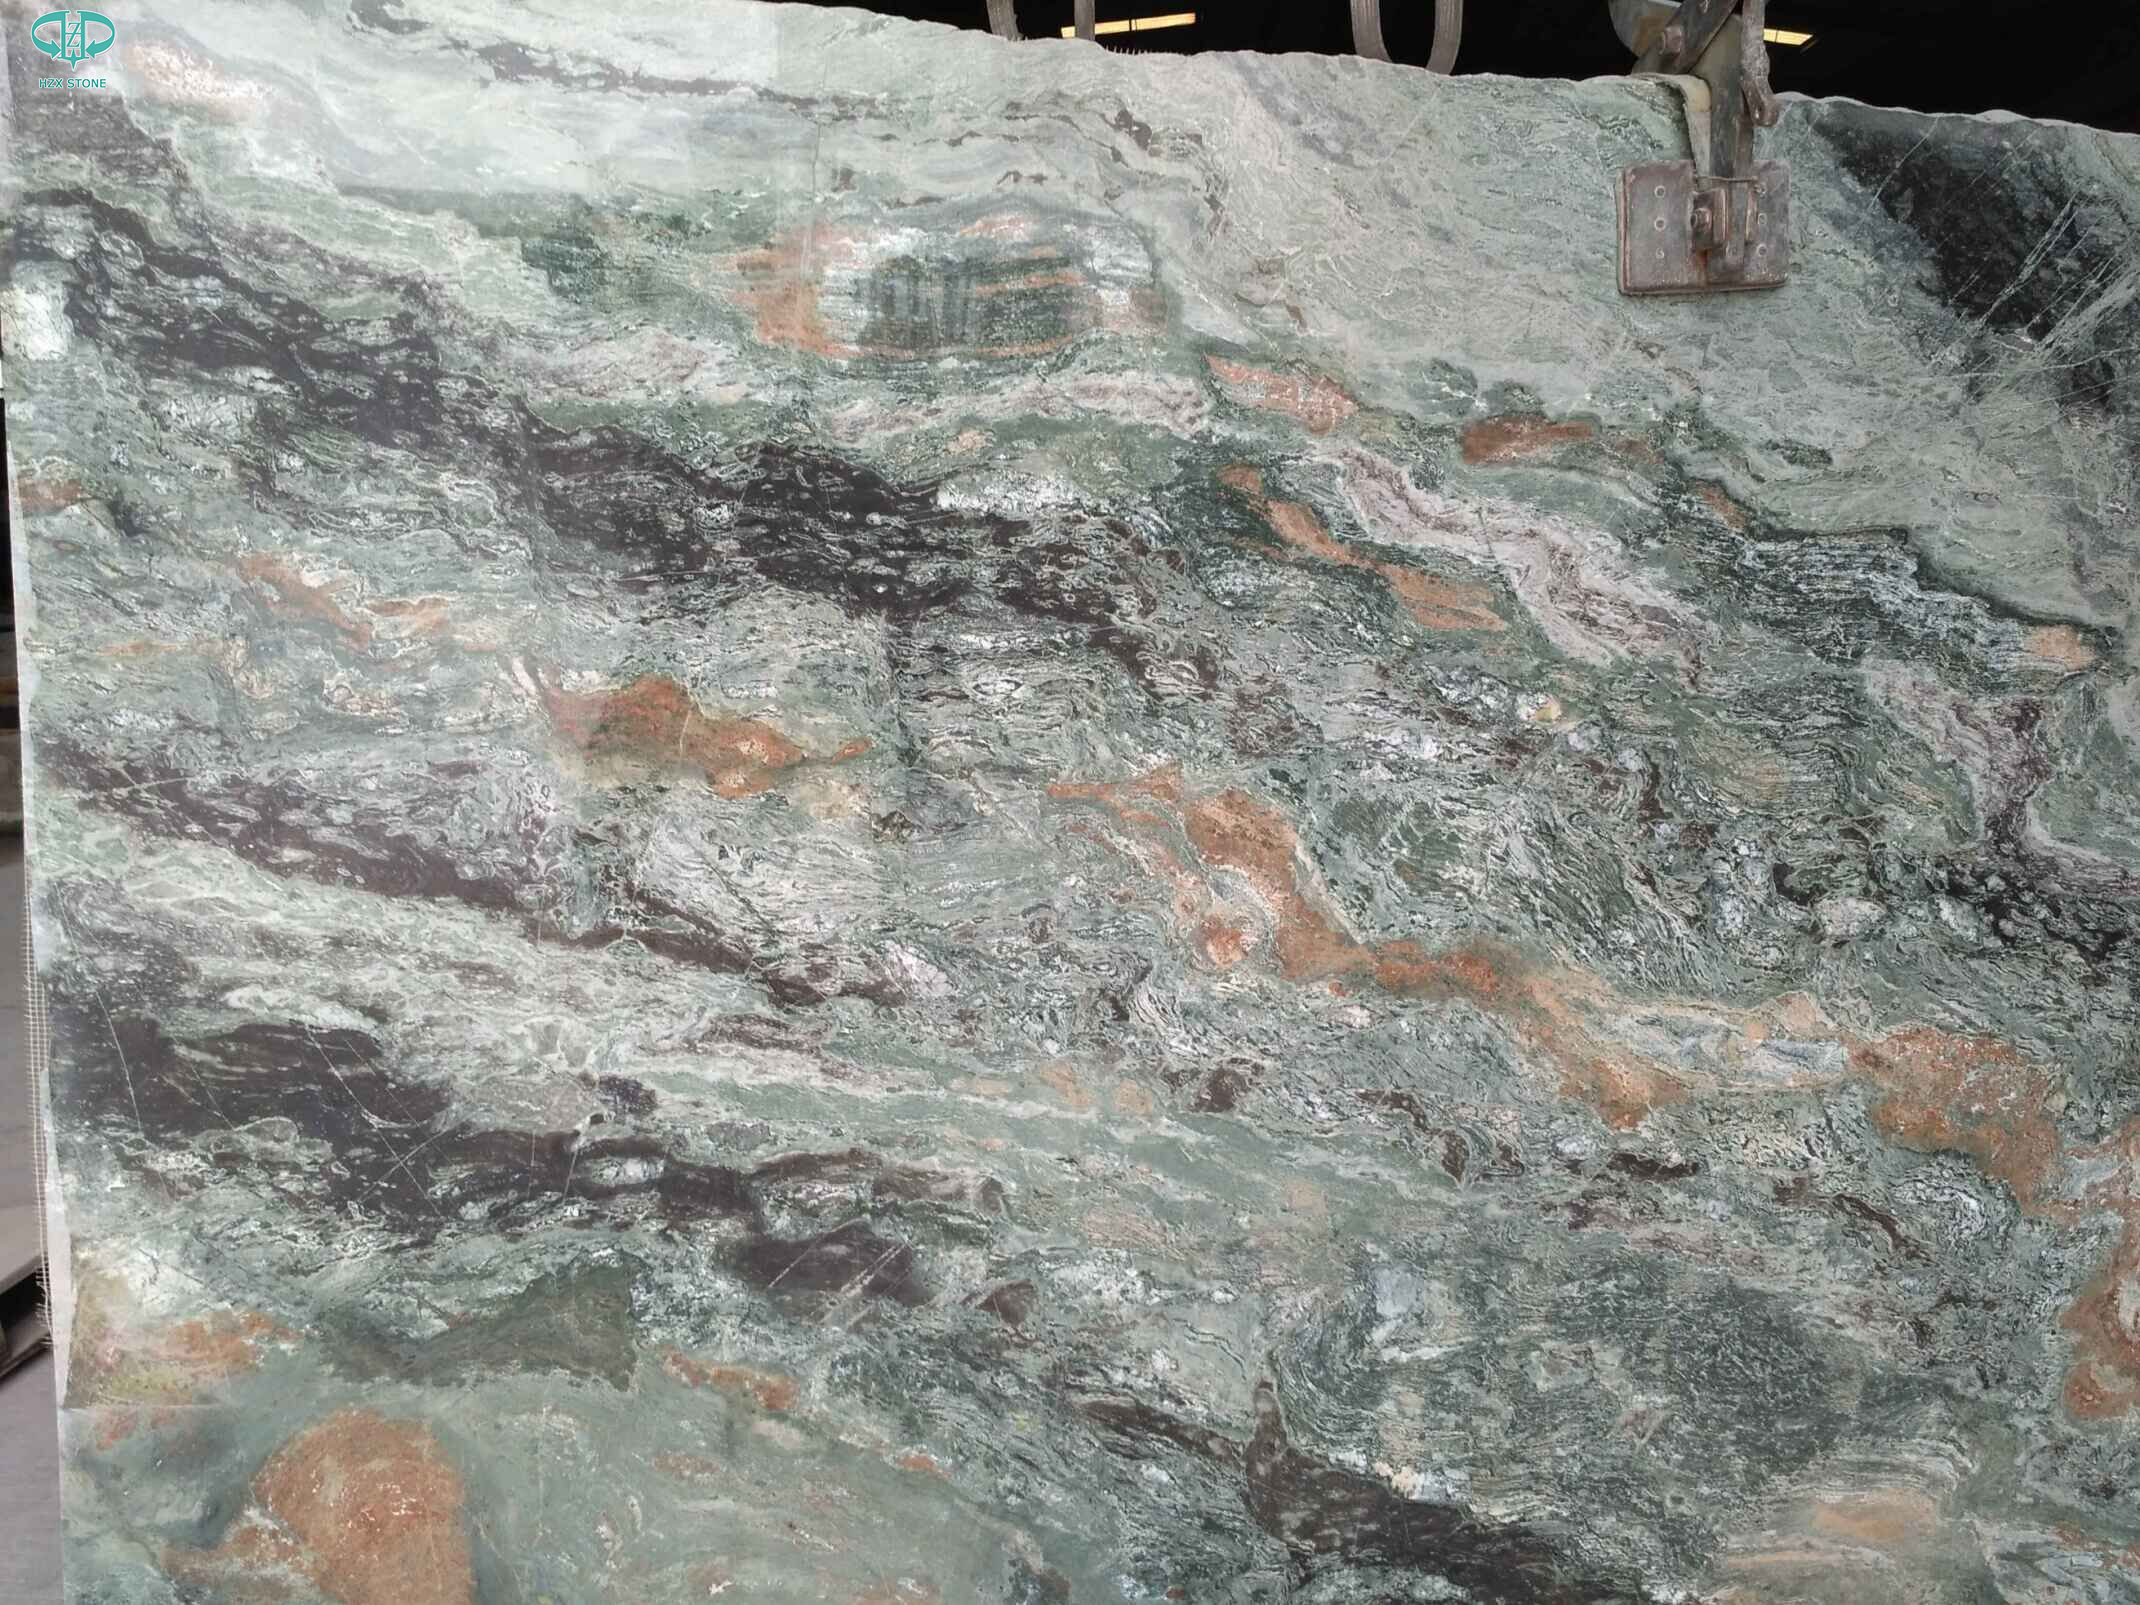 BuyEmerald Green Granite Slabs,Green Granite,Green Granite StoneProducts onChina HZX Stone